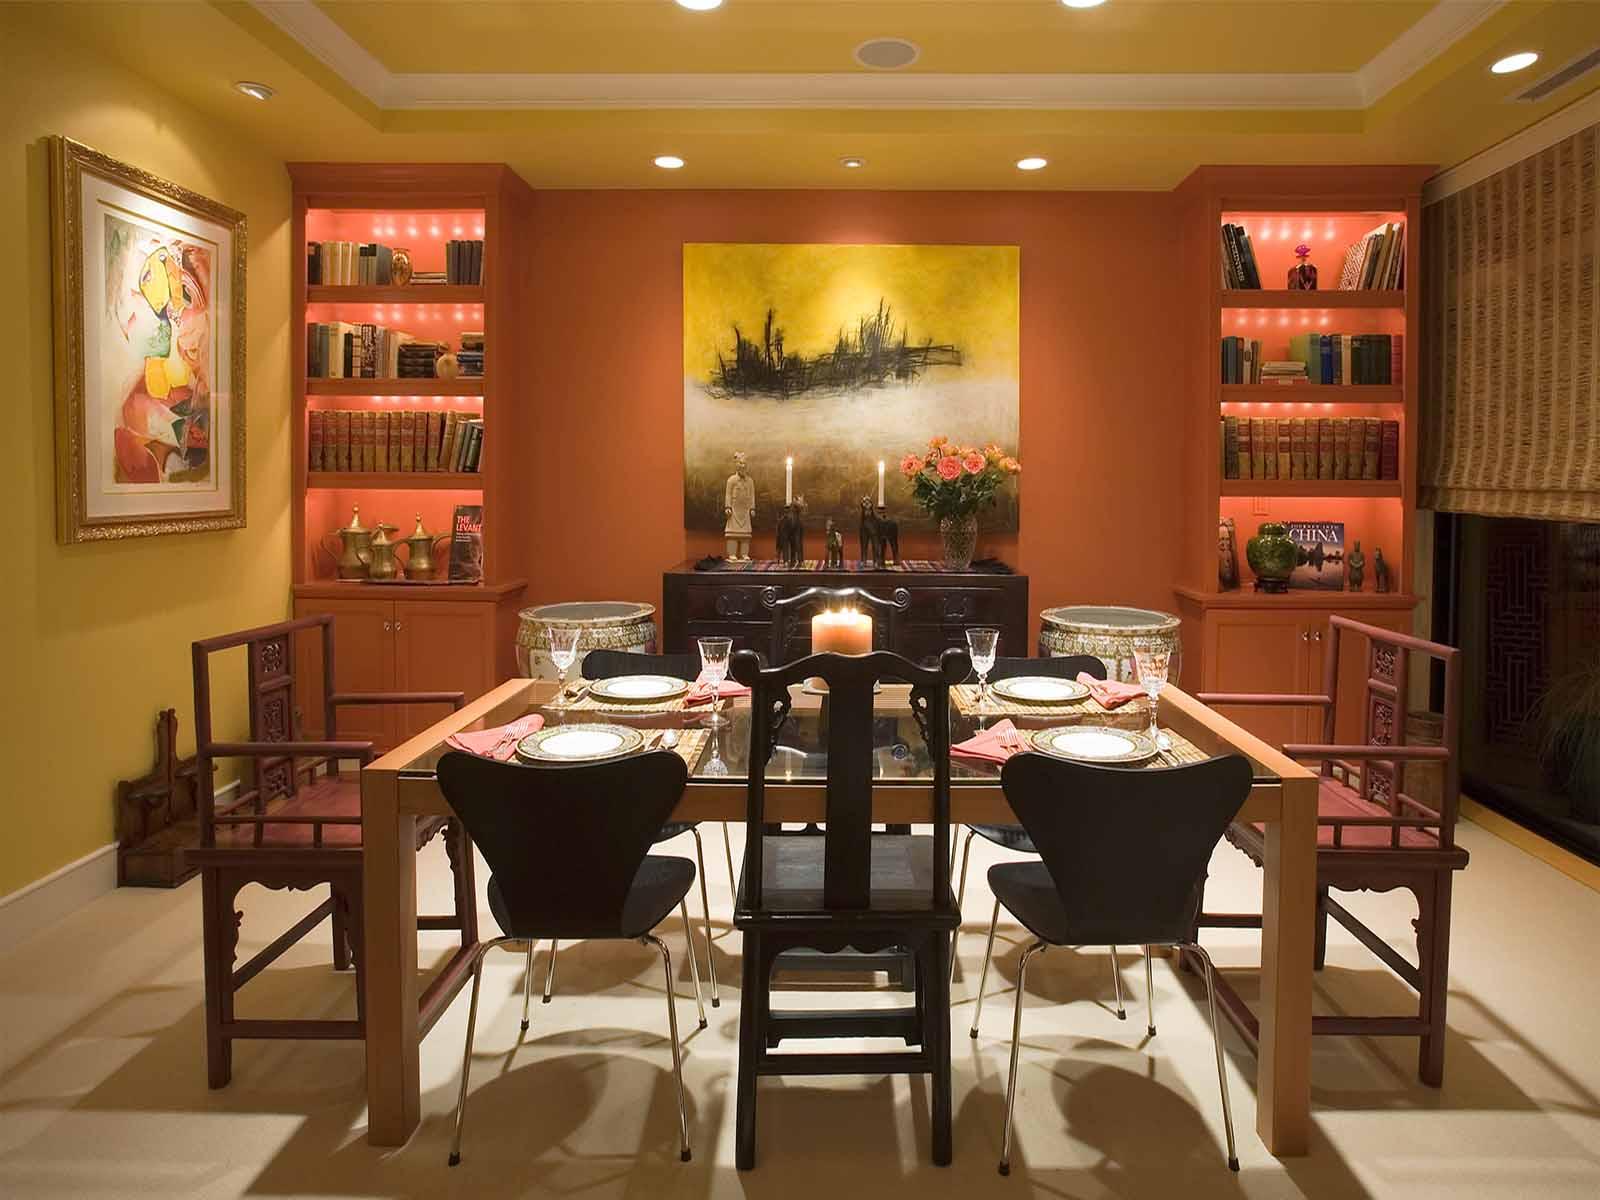 helga simmons design original slide showing dining room